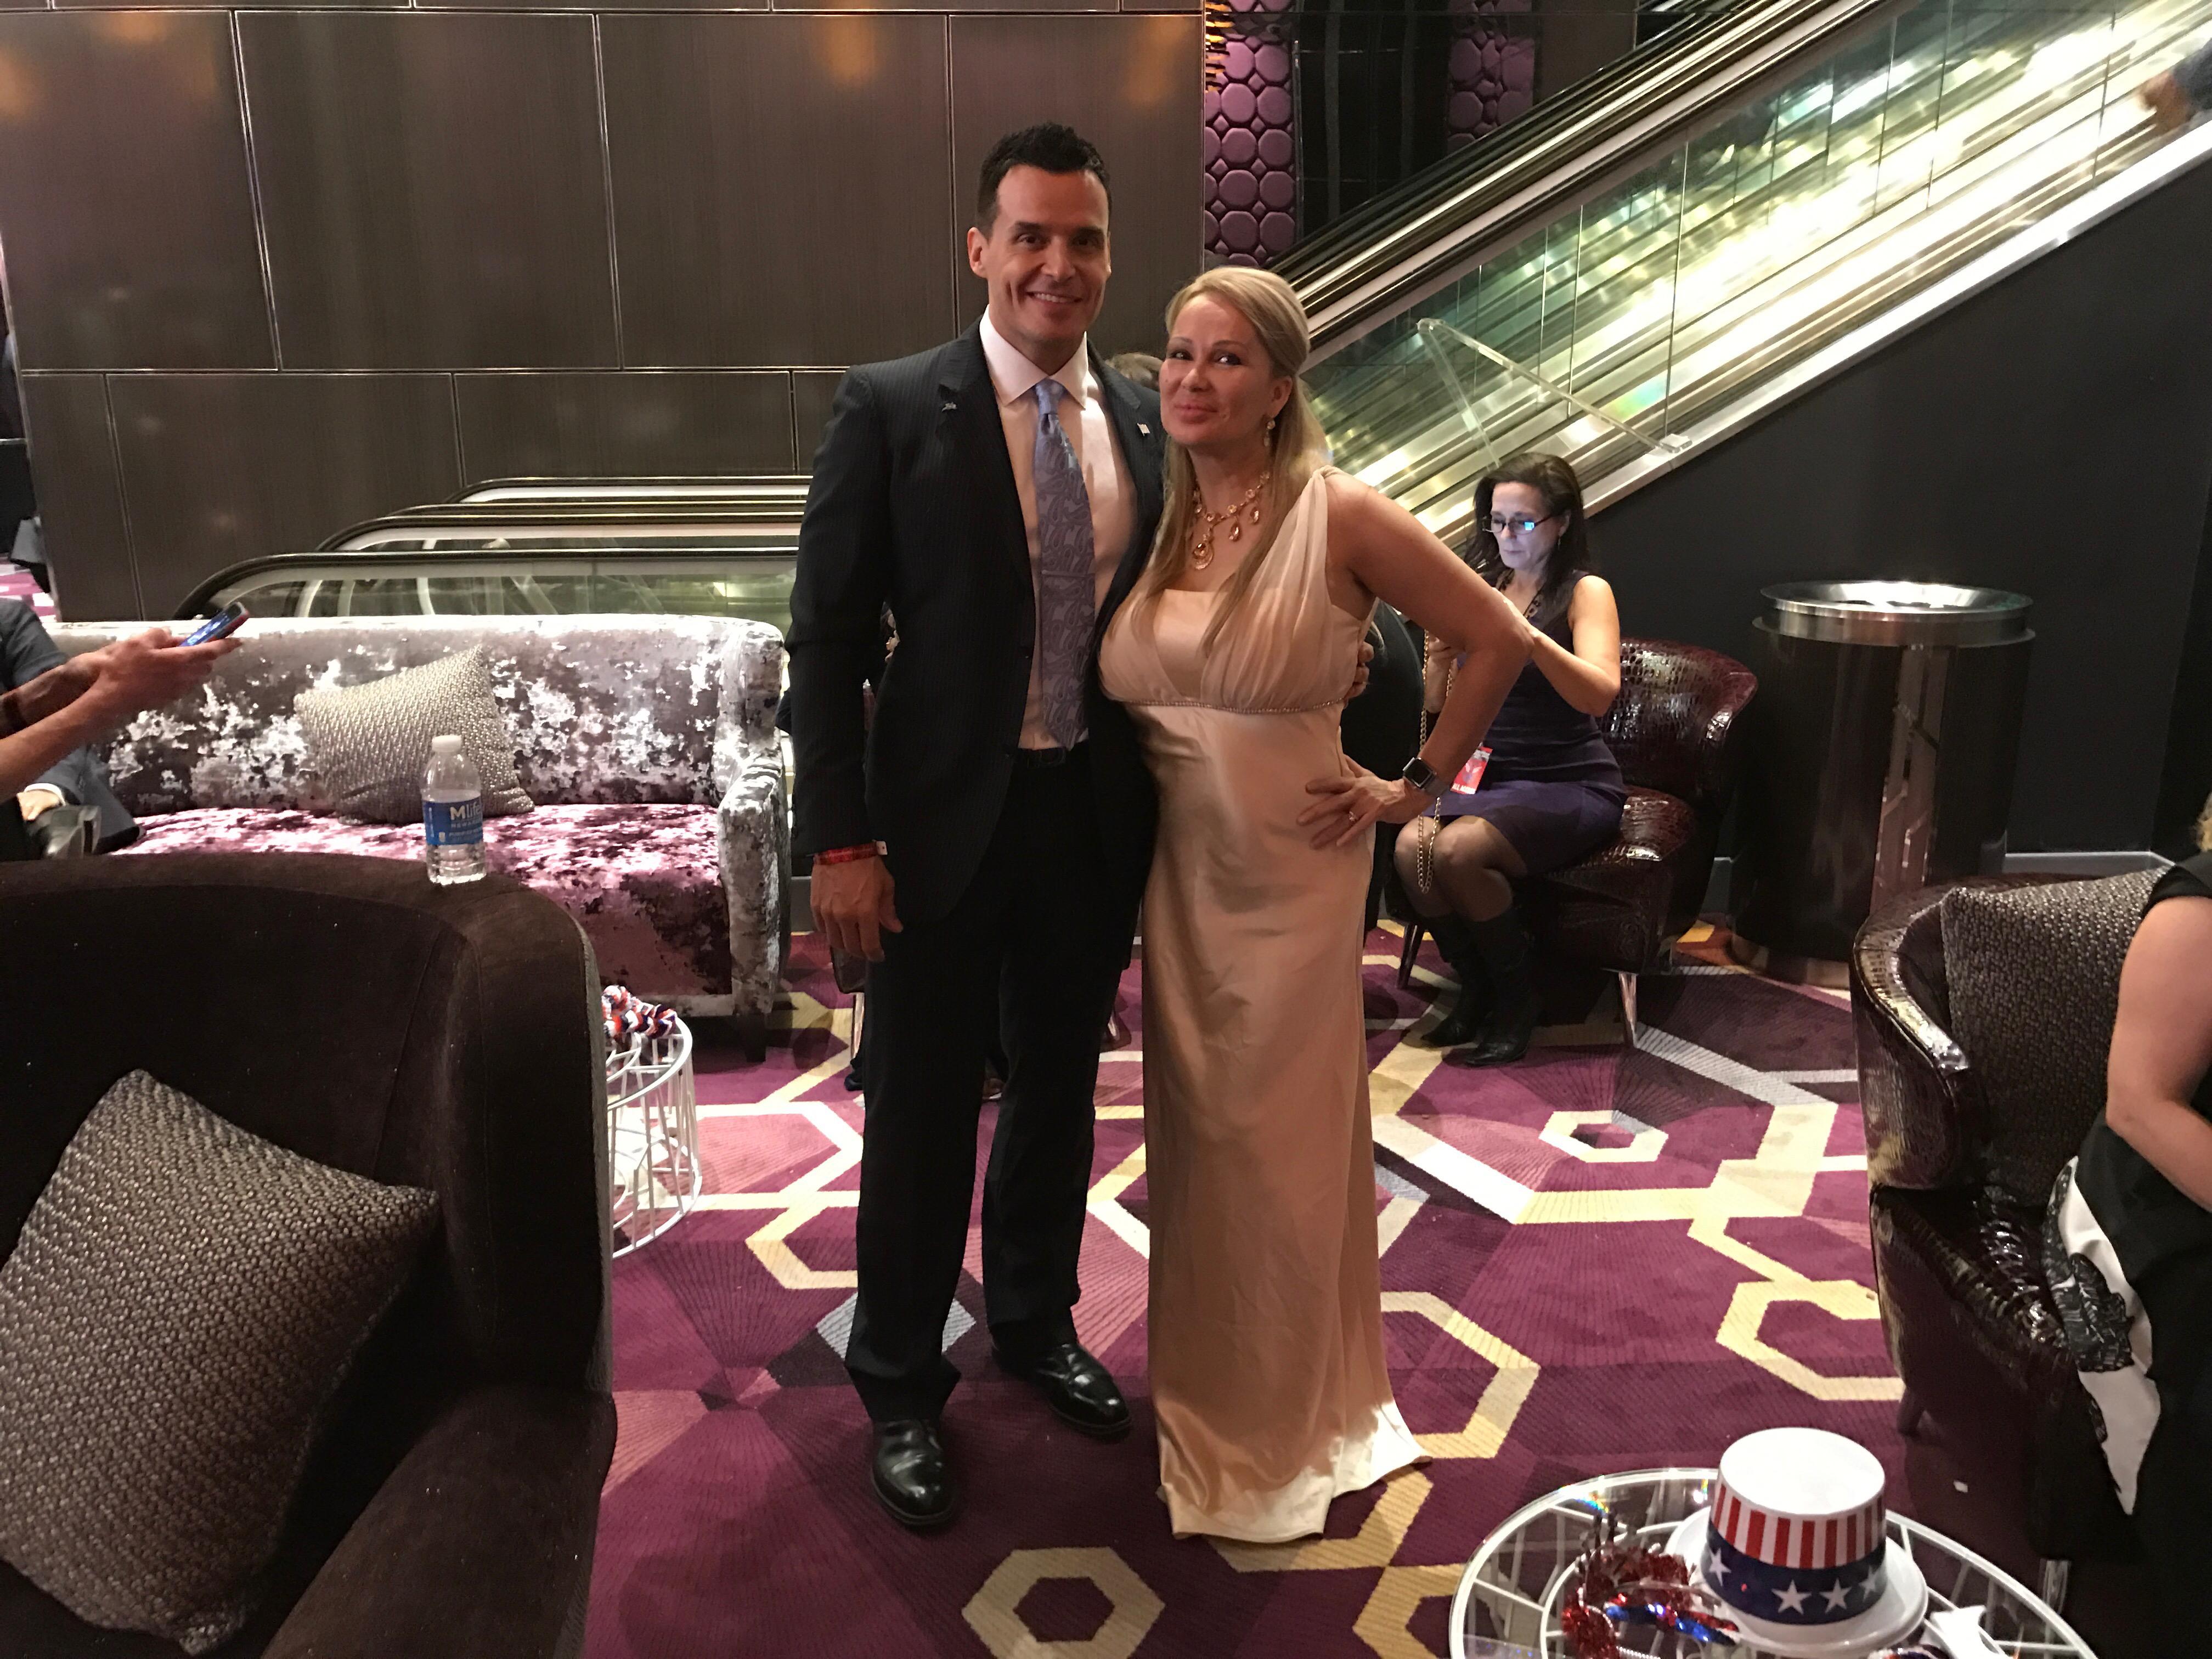 Antonio Sabato Jr and Lisa Christiansen